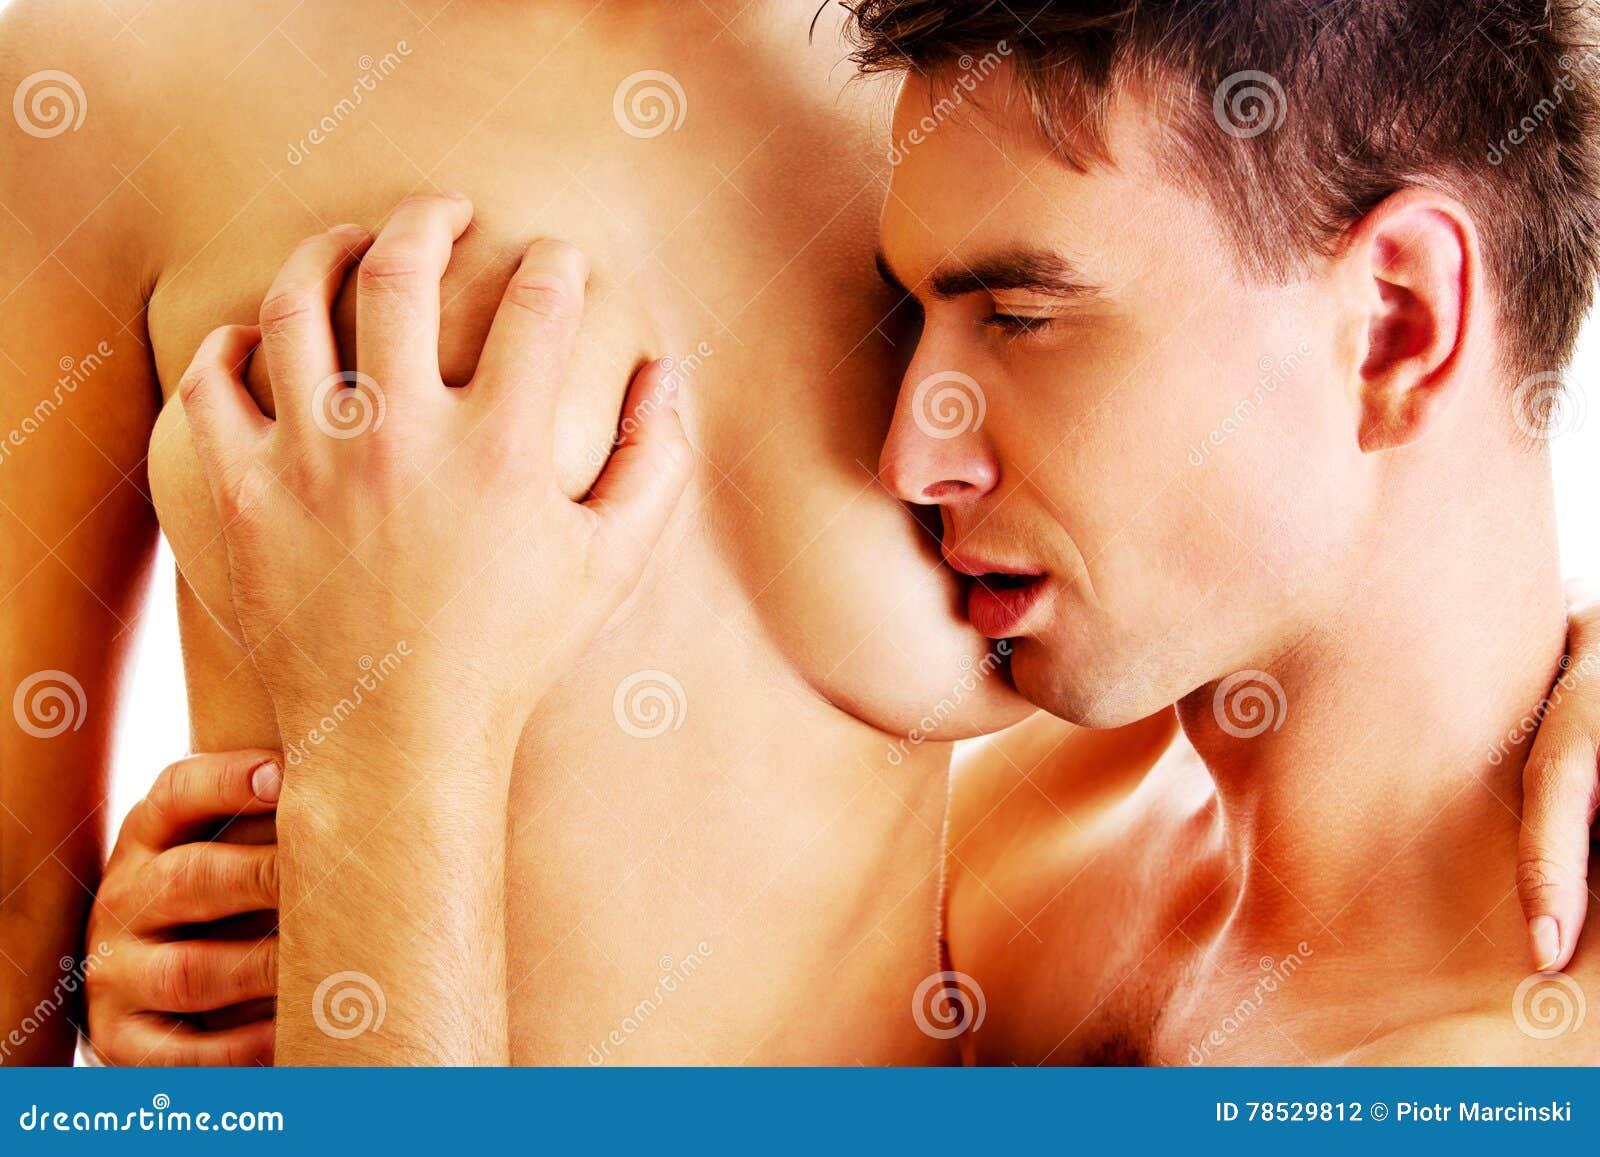 Boy kiss girl breast